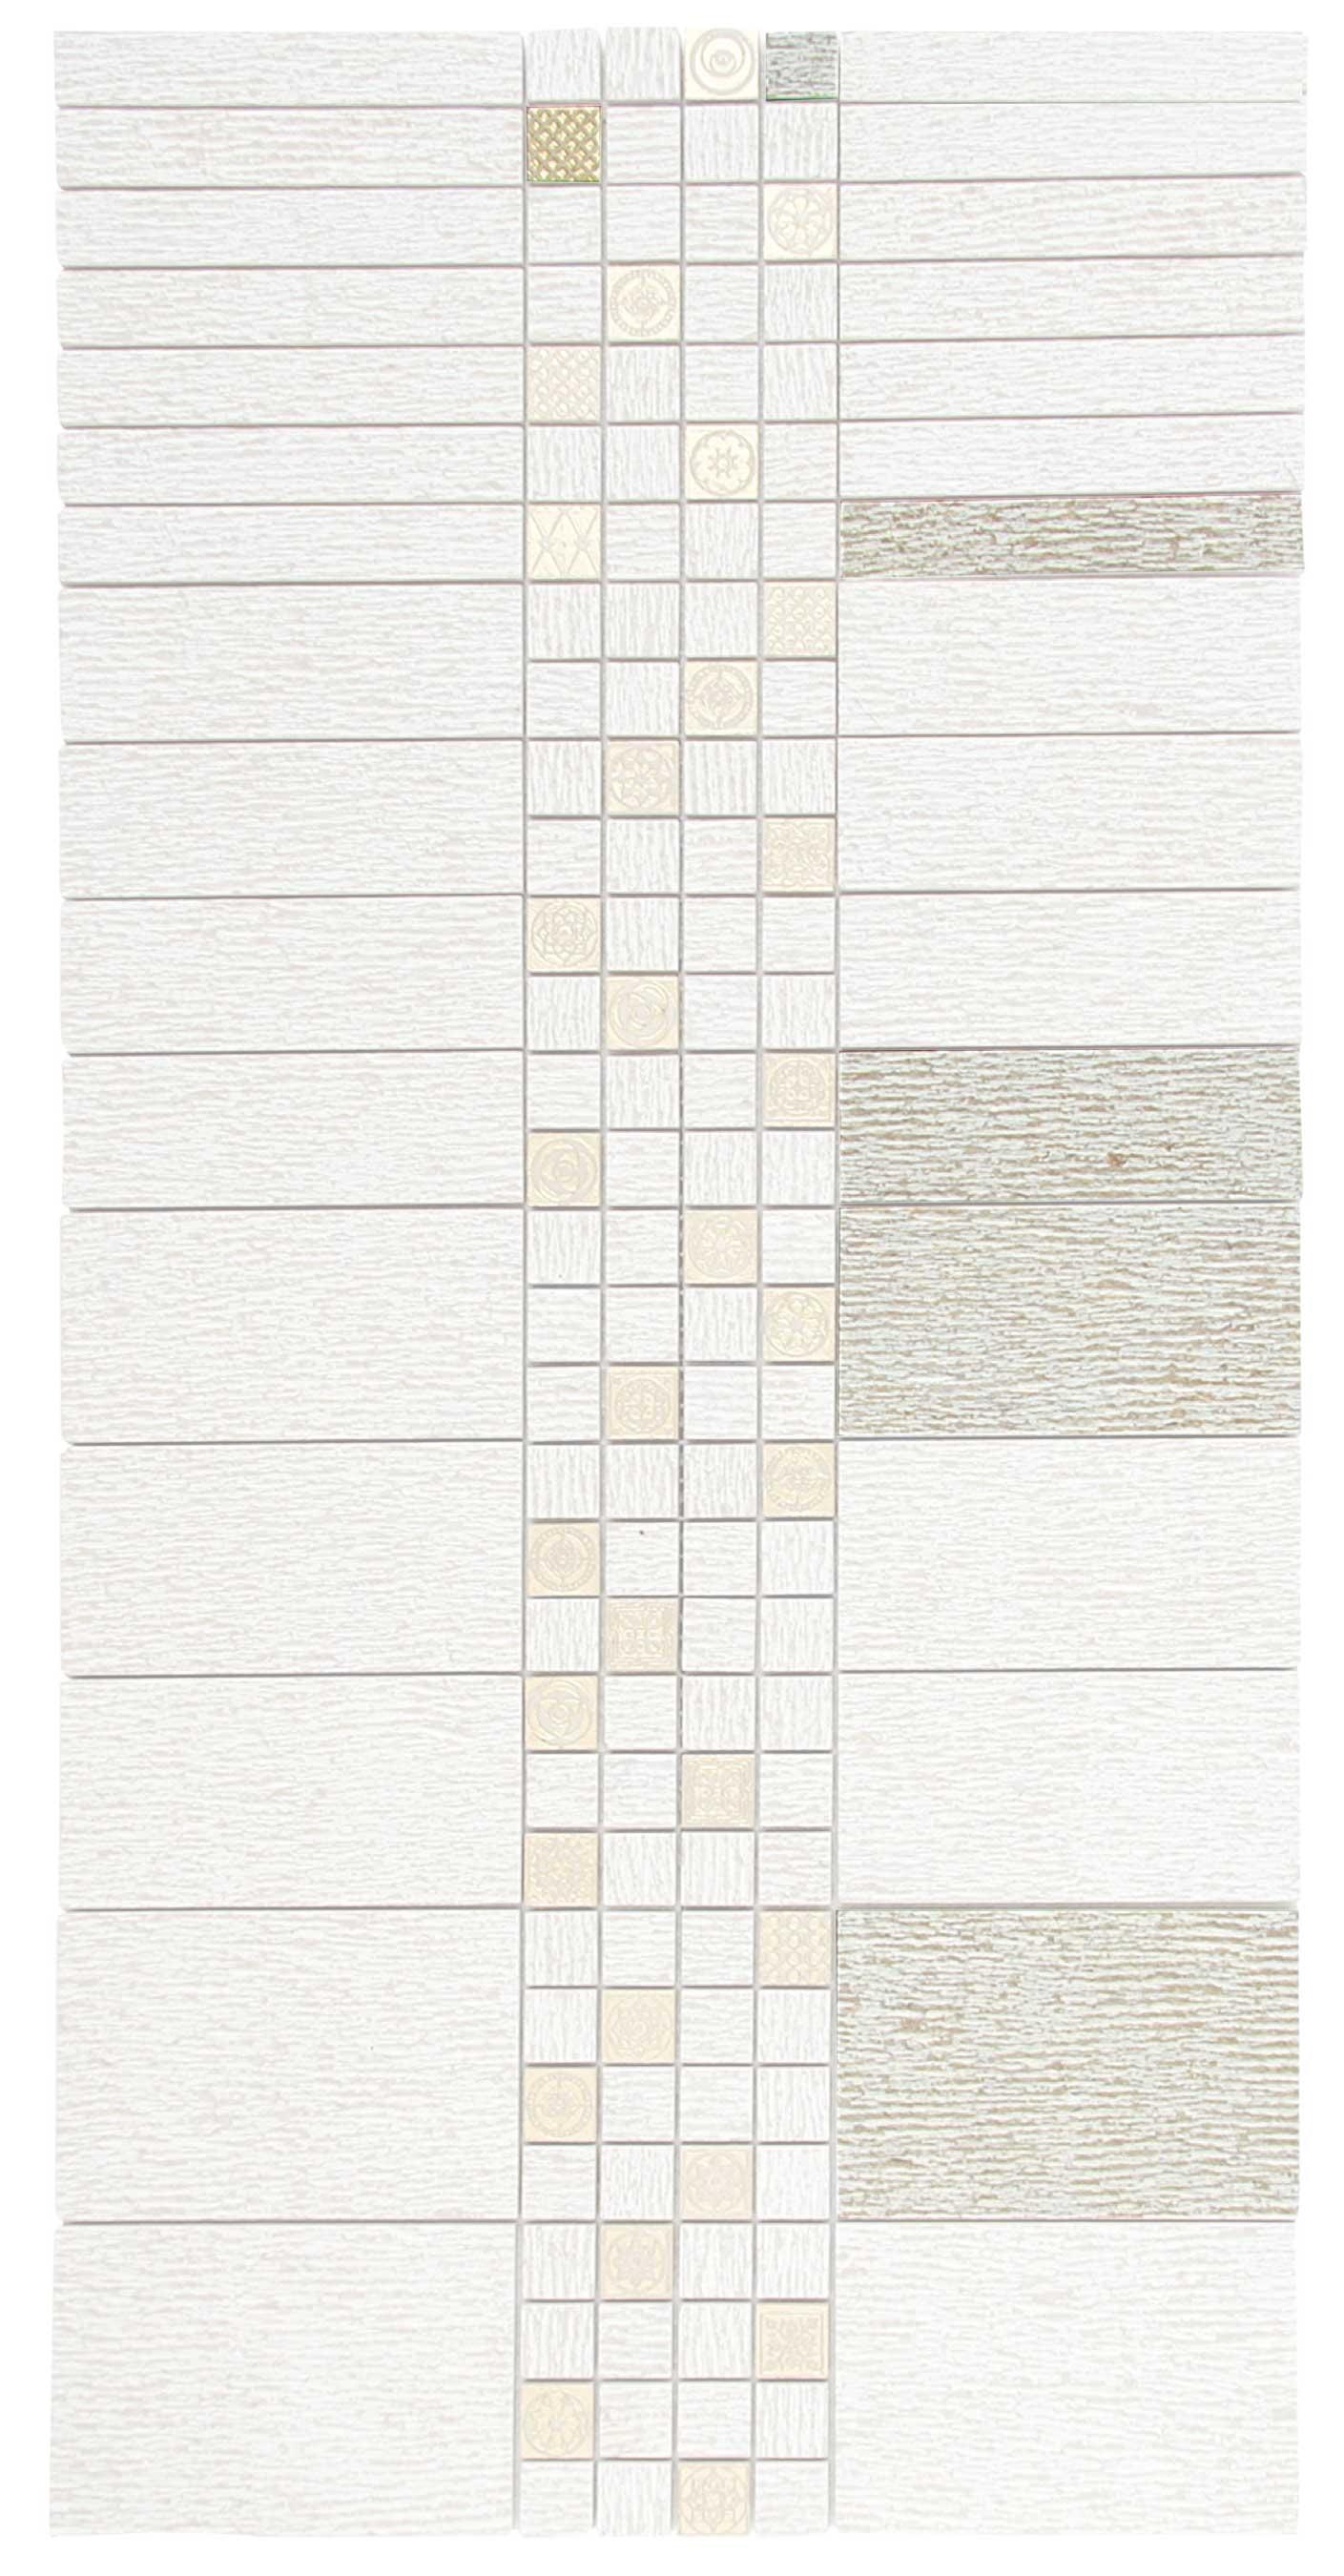 Lithos mosaico italia